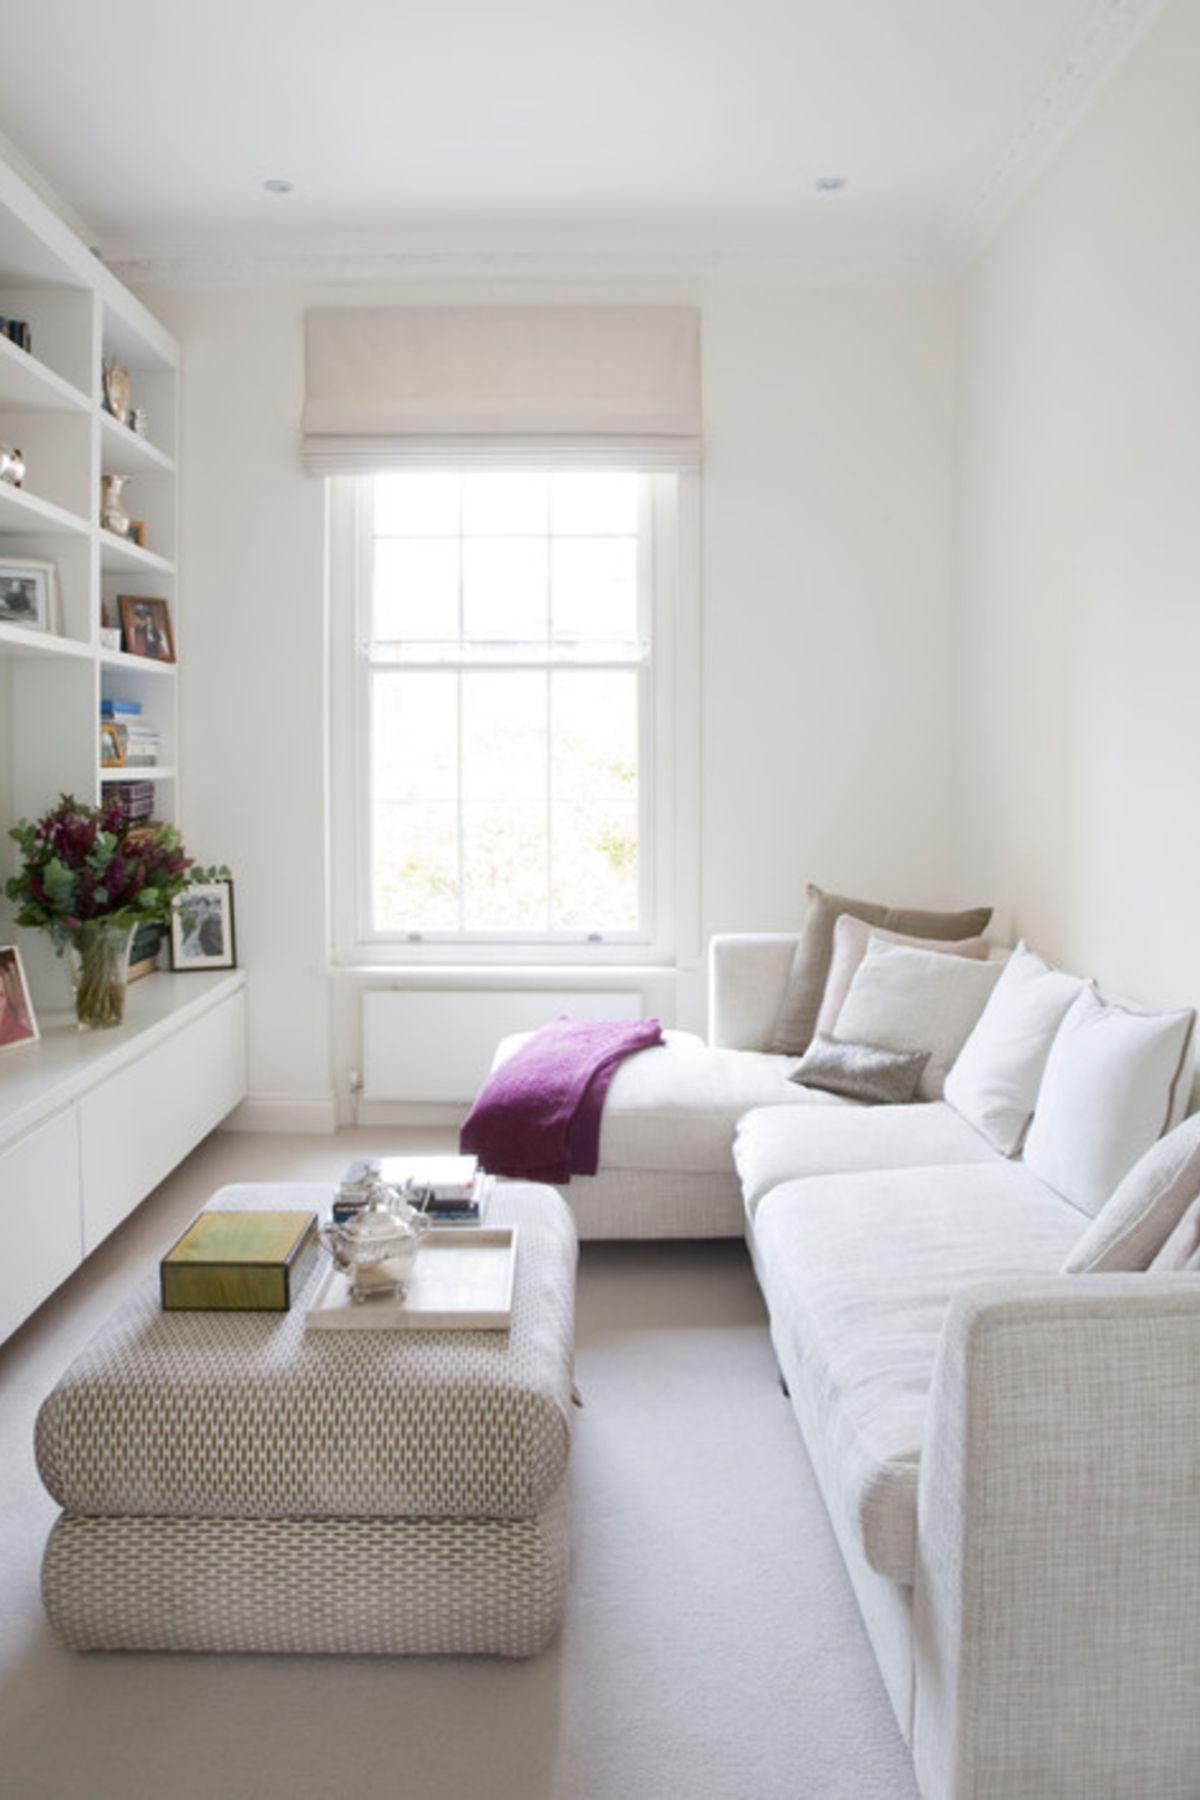 51 Bachelor Living Room Decor Ideas In 2019 Small Living Room